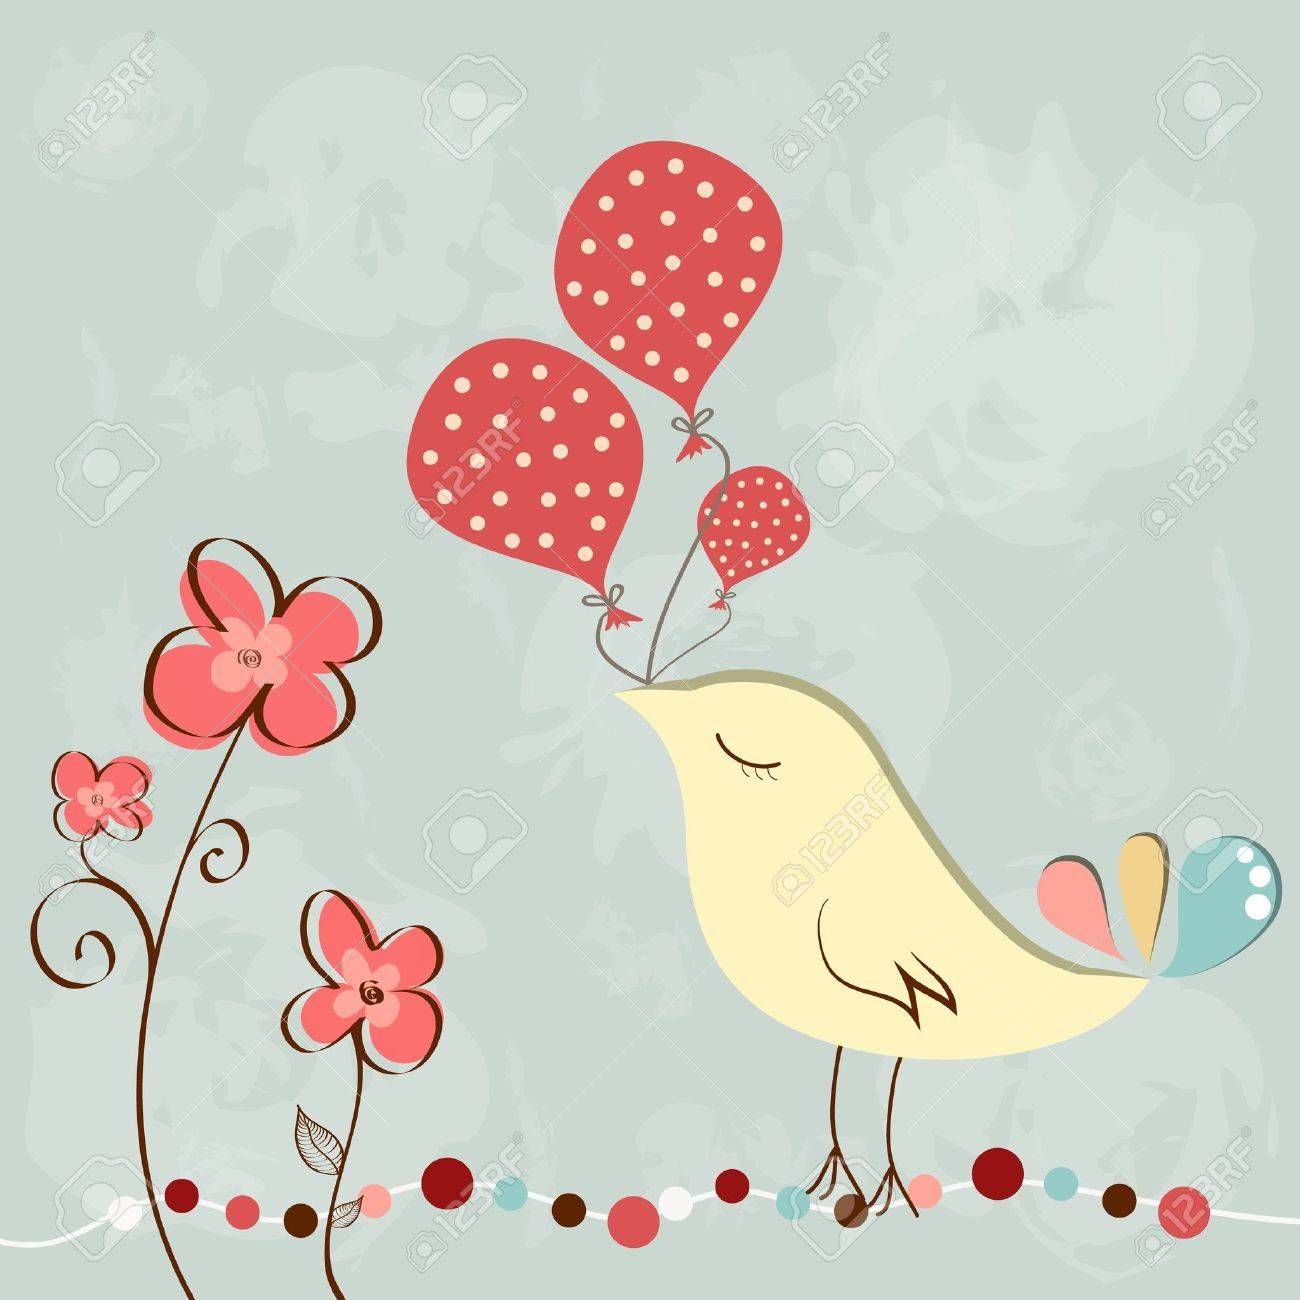 Wonderful greeting birthday card with cute bird holding balloons - 18393543